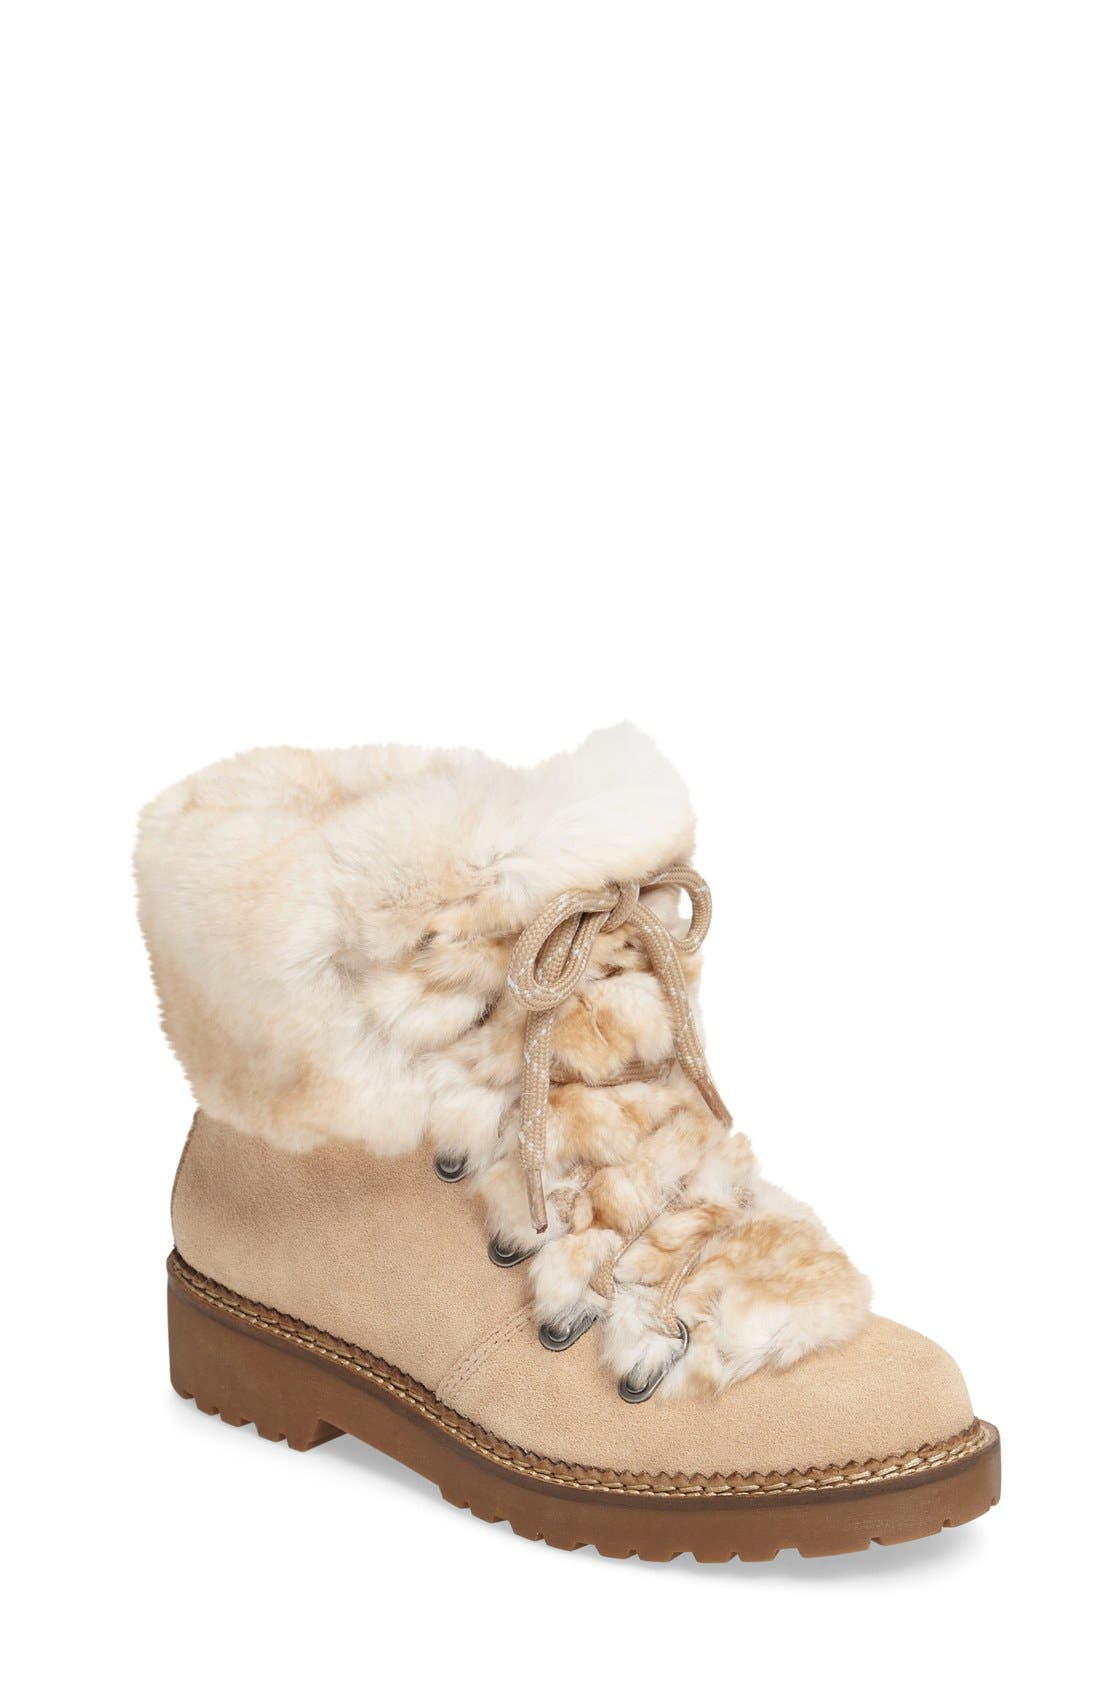 Alternate Image 1 Selected - Arturo Chiang 'Philippa' Genuine Rabbit Fur Hiking Boot (Women)